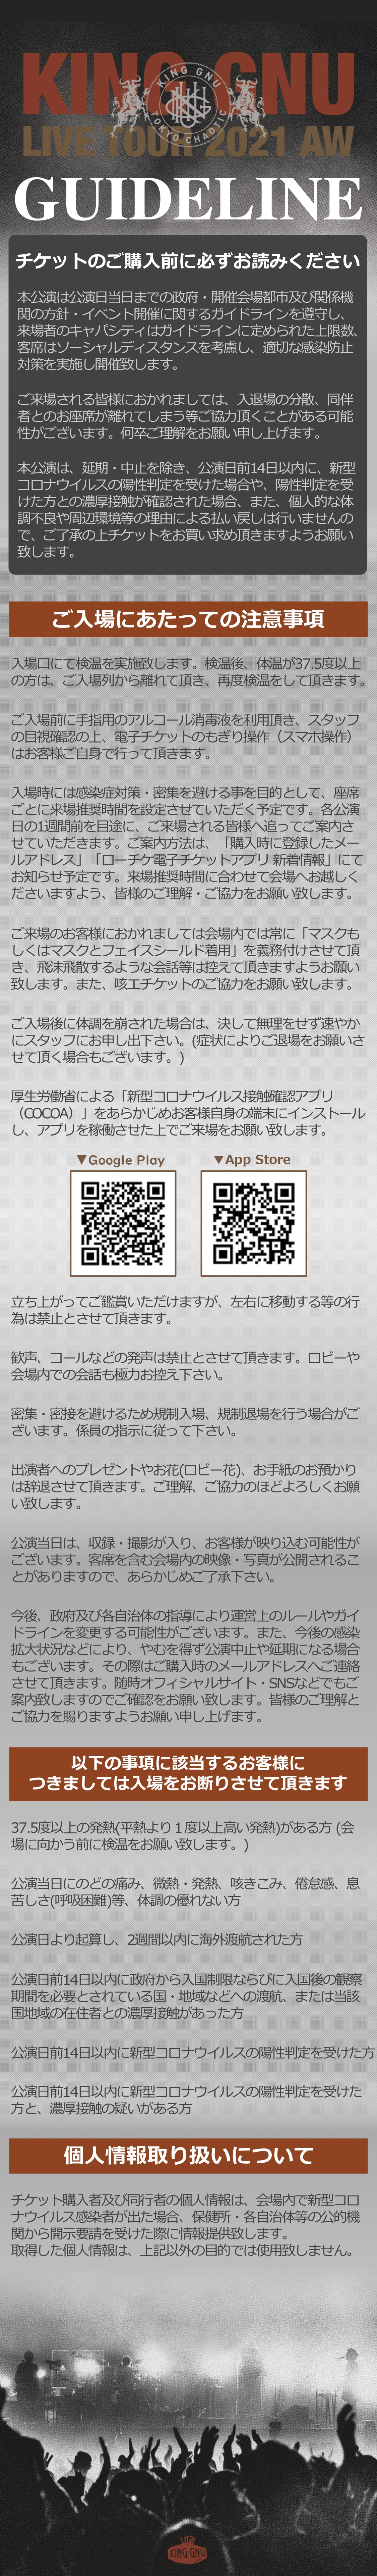 kinggnu_guideline